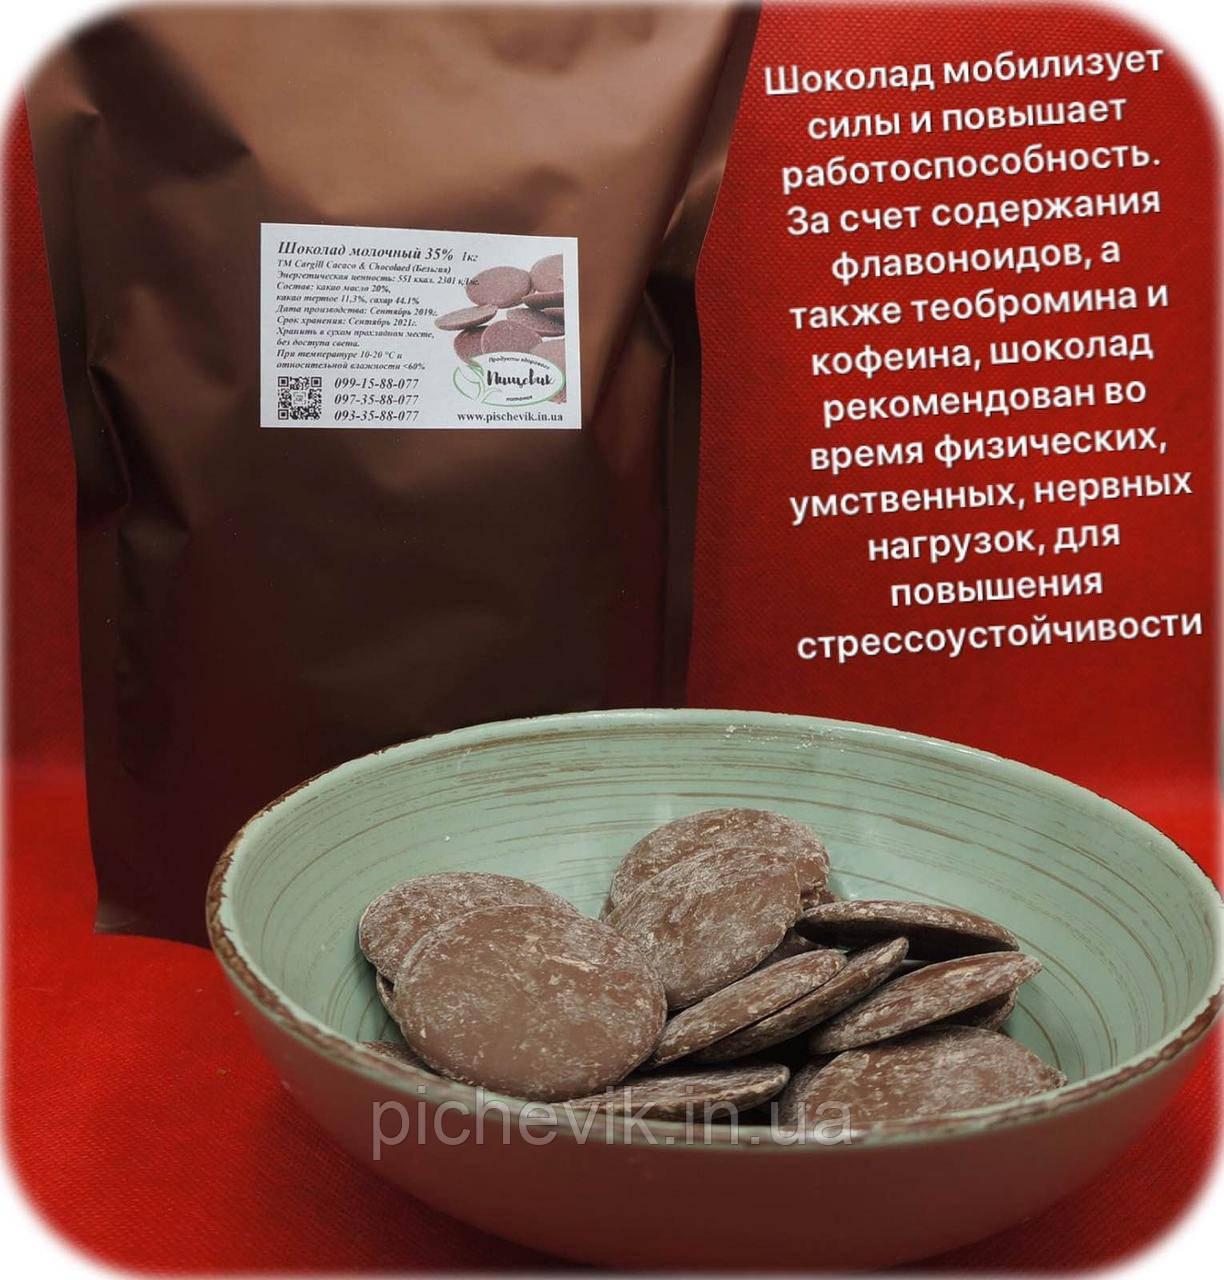 Молочный шоколад 35% ТМ Сargill Cacaco & Chocolaed (Бельгия) Вес:150 гр